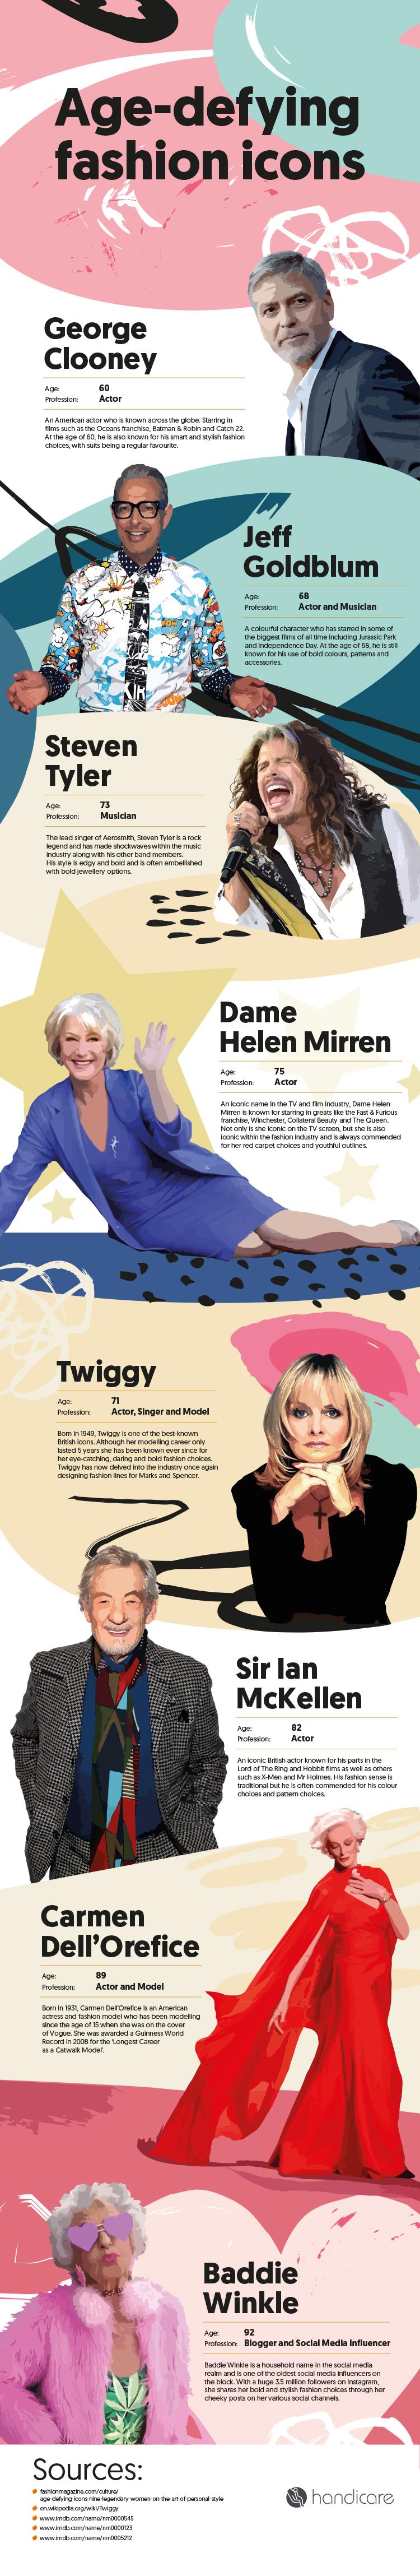 Fashion icons infographic